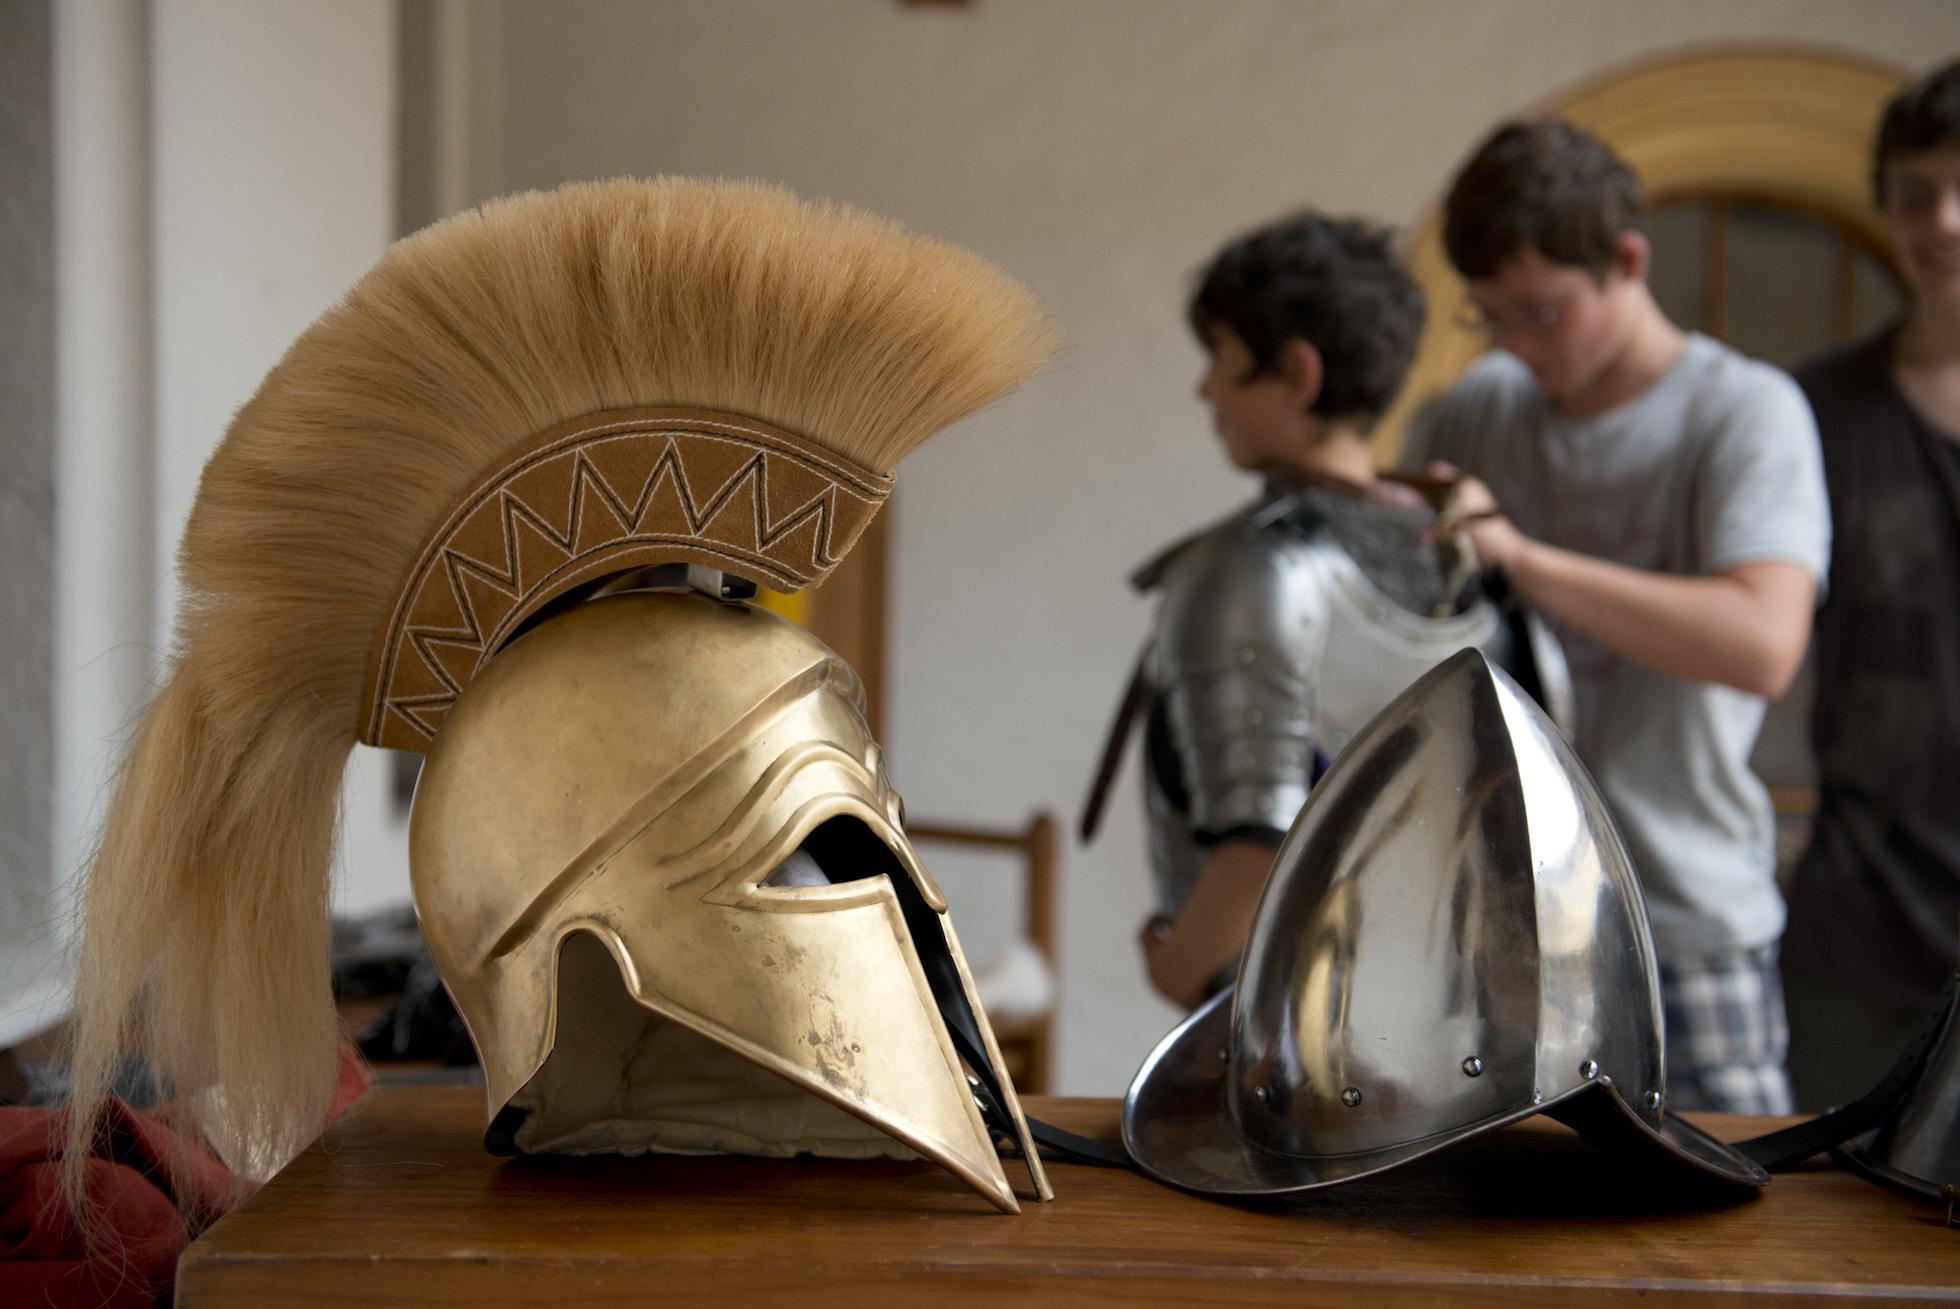 casques historiques